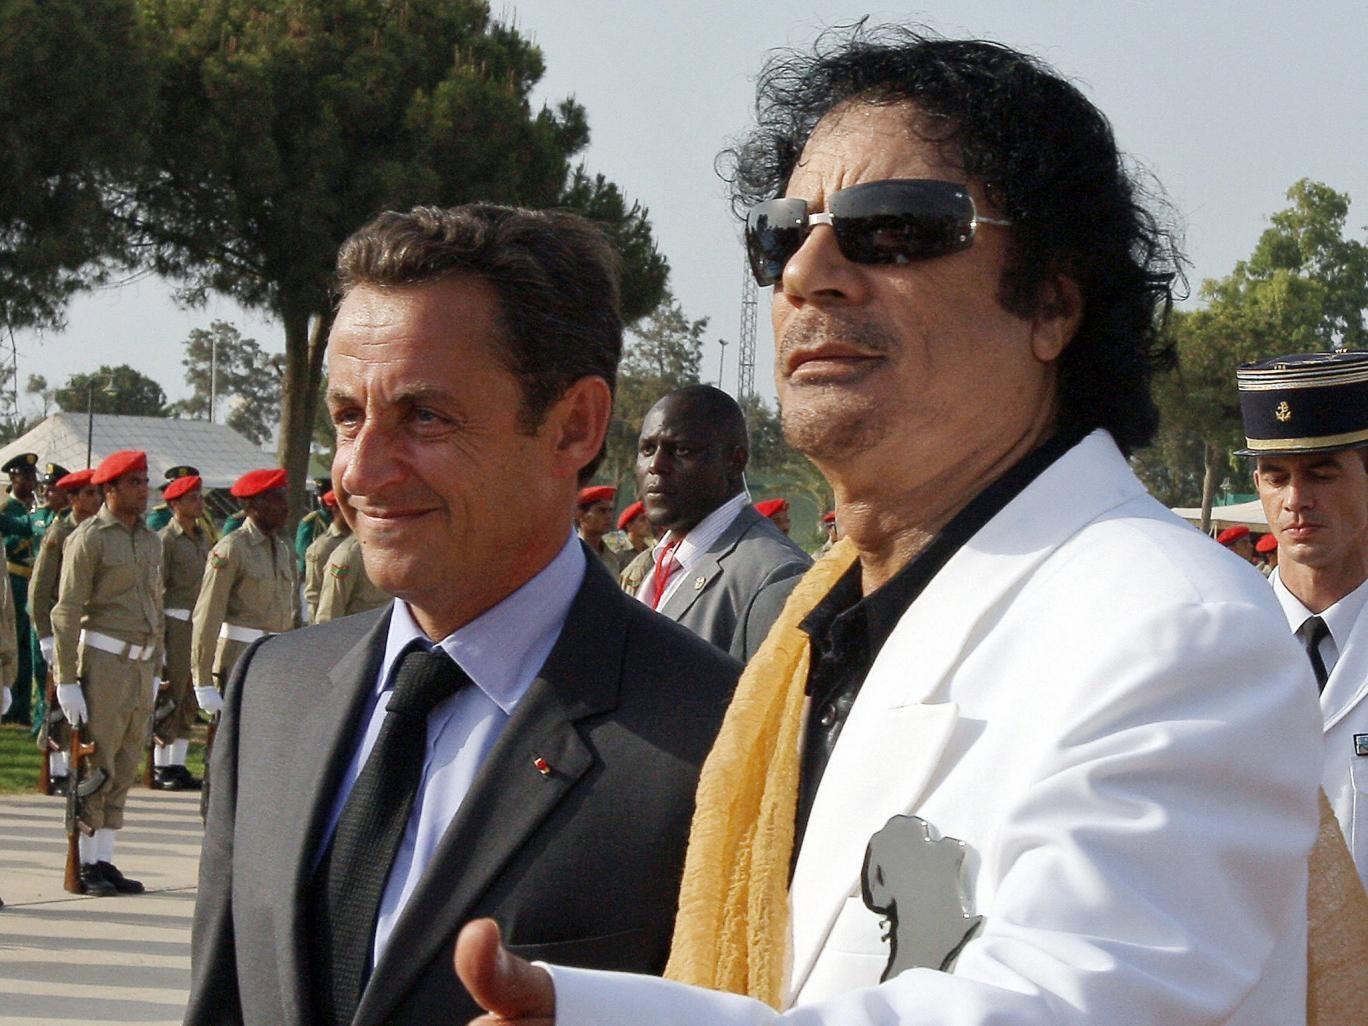 Nicolas Sarkozy is welcomed to Libya by Muammar Gaddafi in 2007